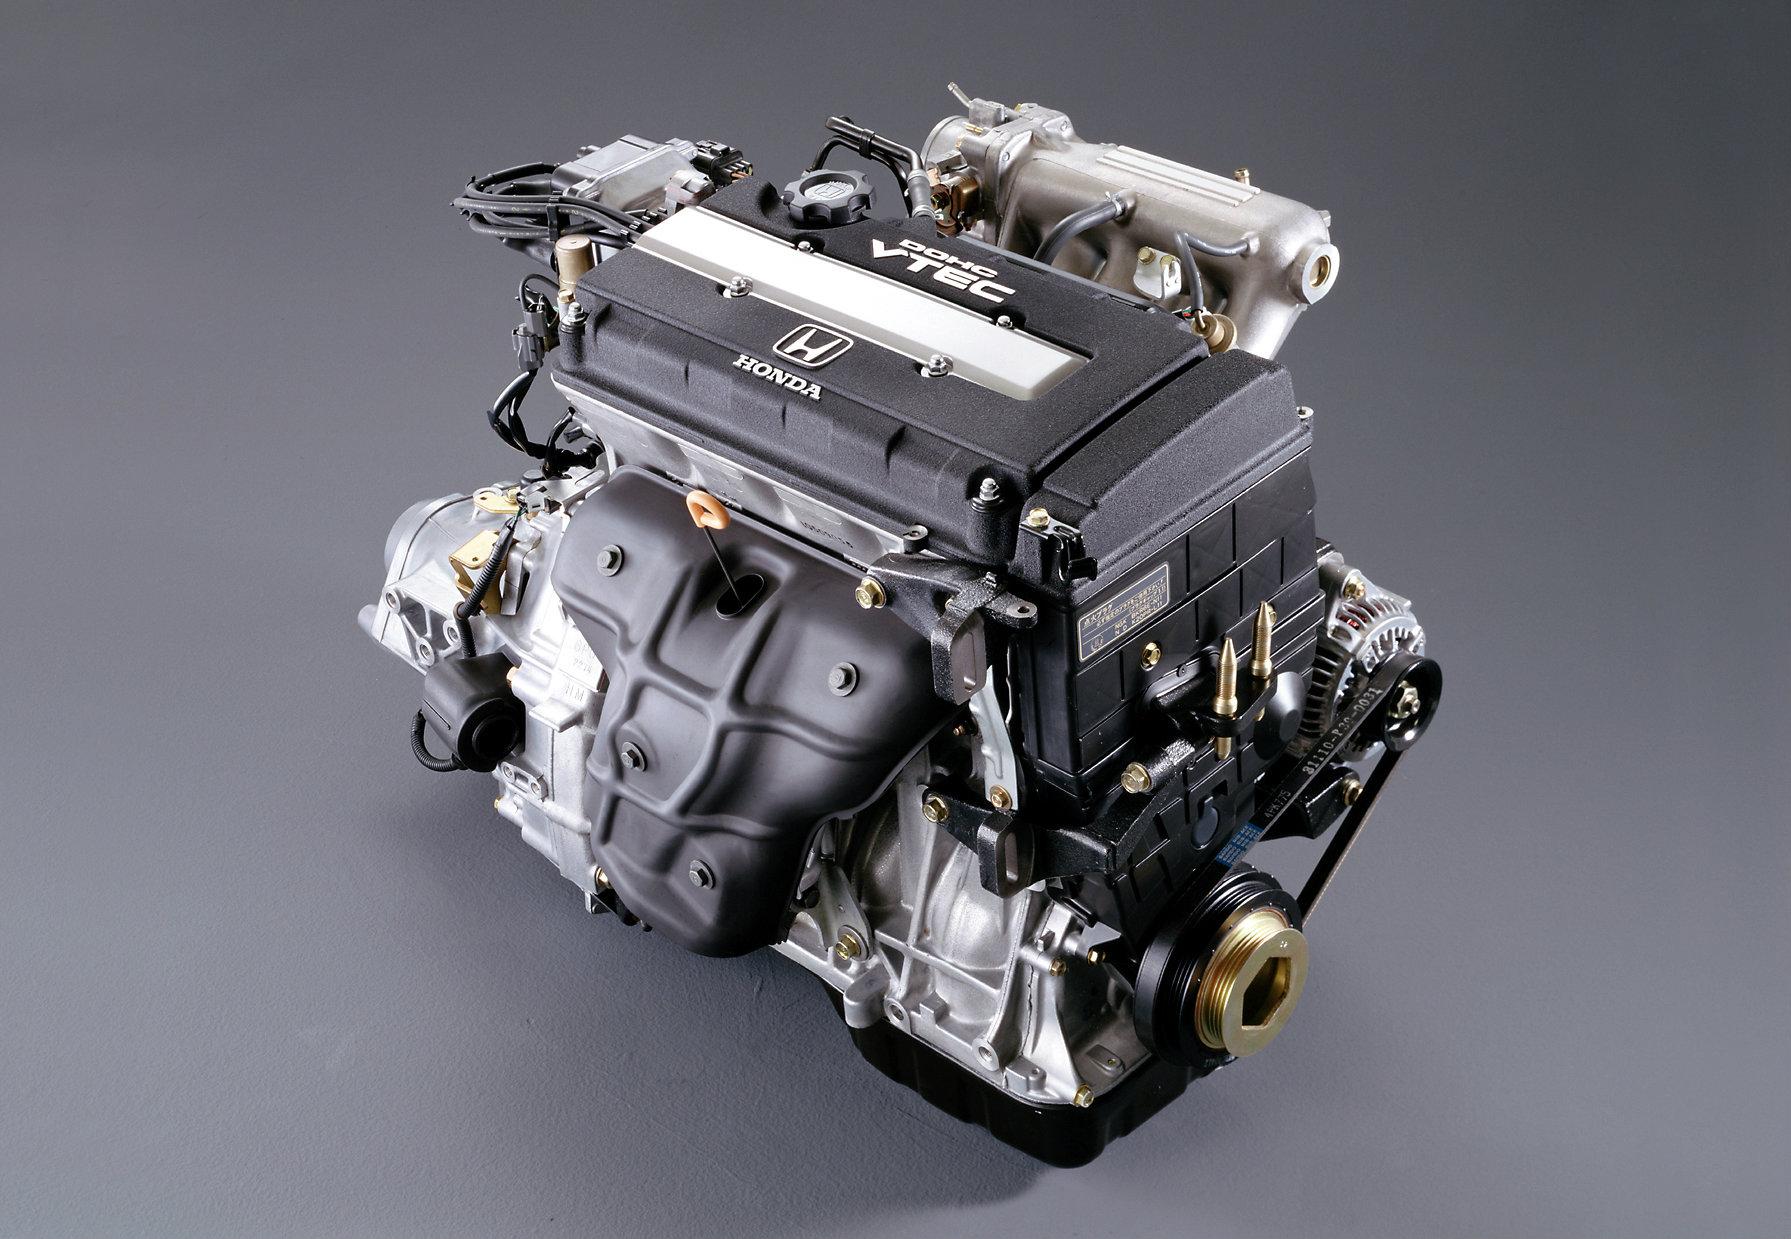 Jasma Racing Camshaft Cam Gear B16 B17 B18 GSR Vtec Dohc eBay 1791x1239